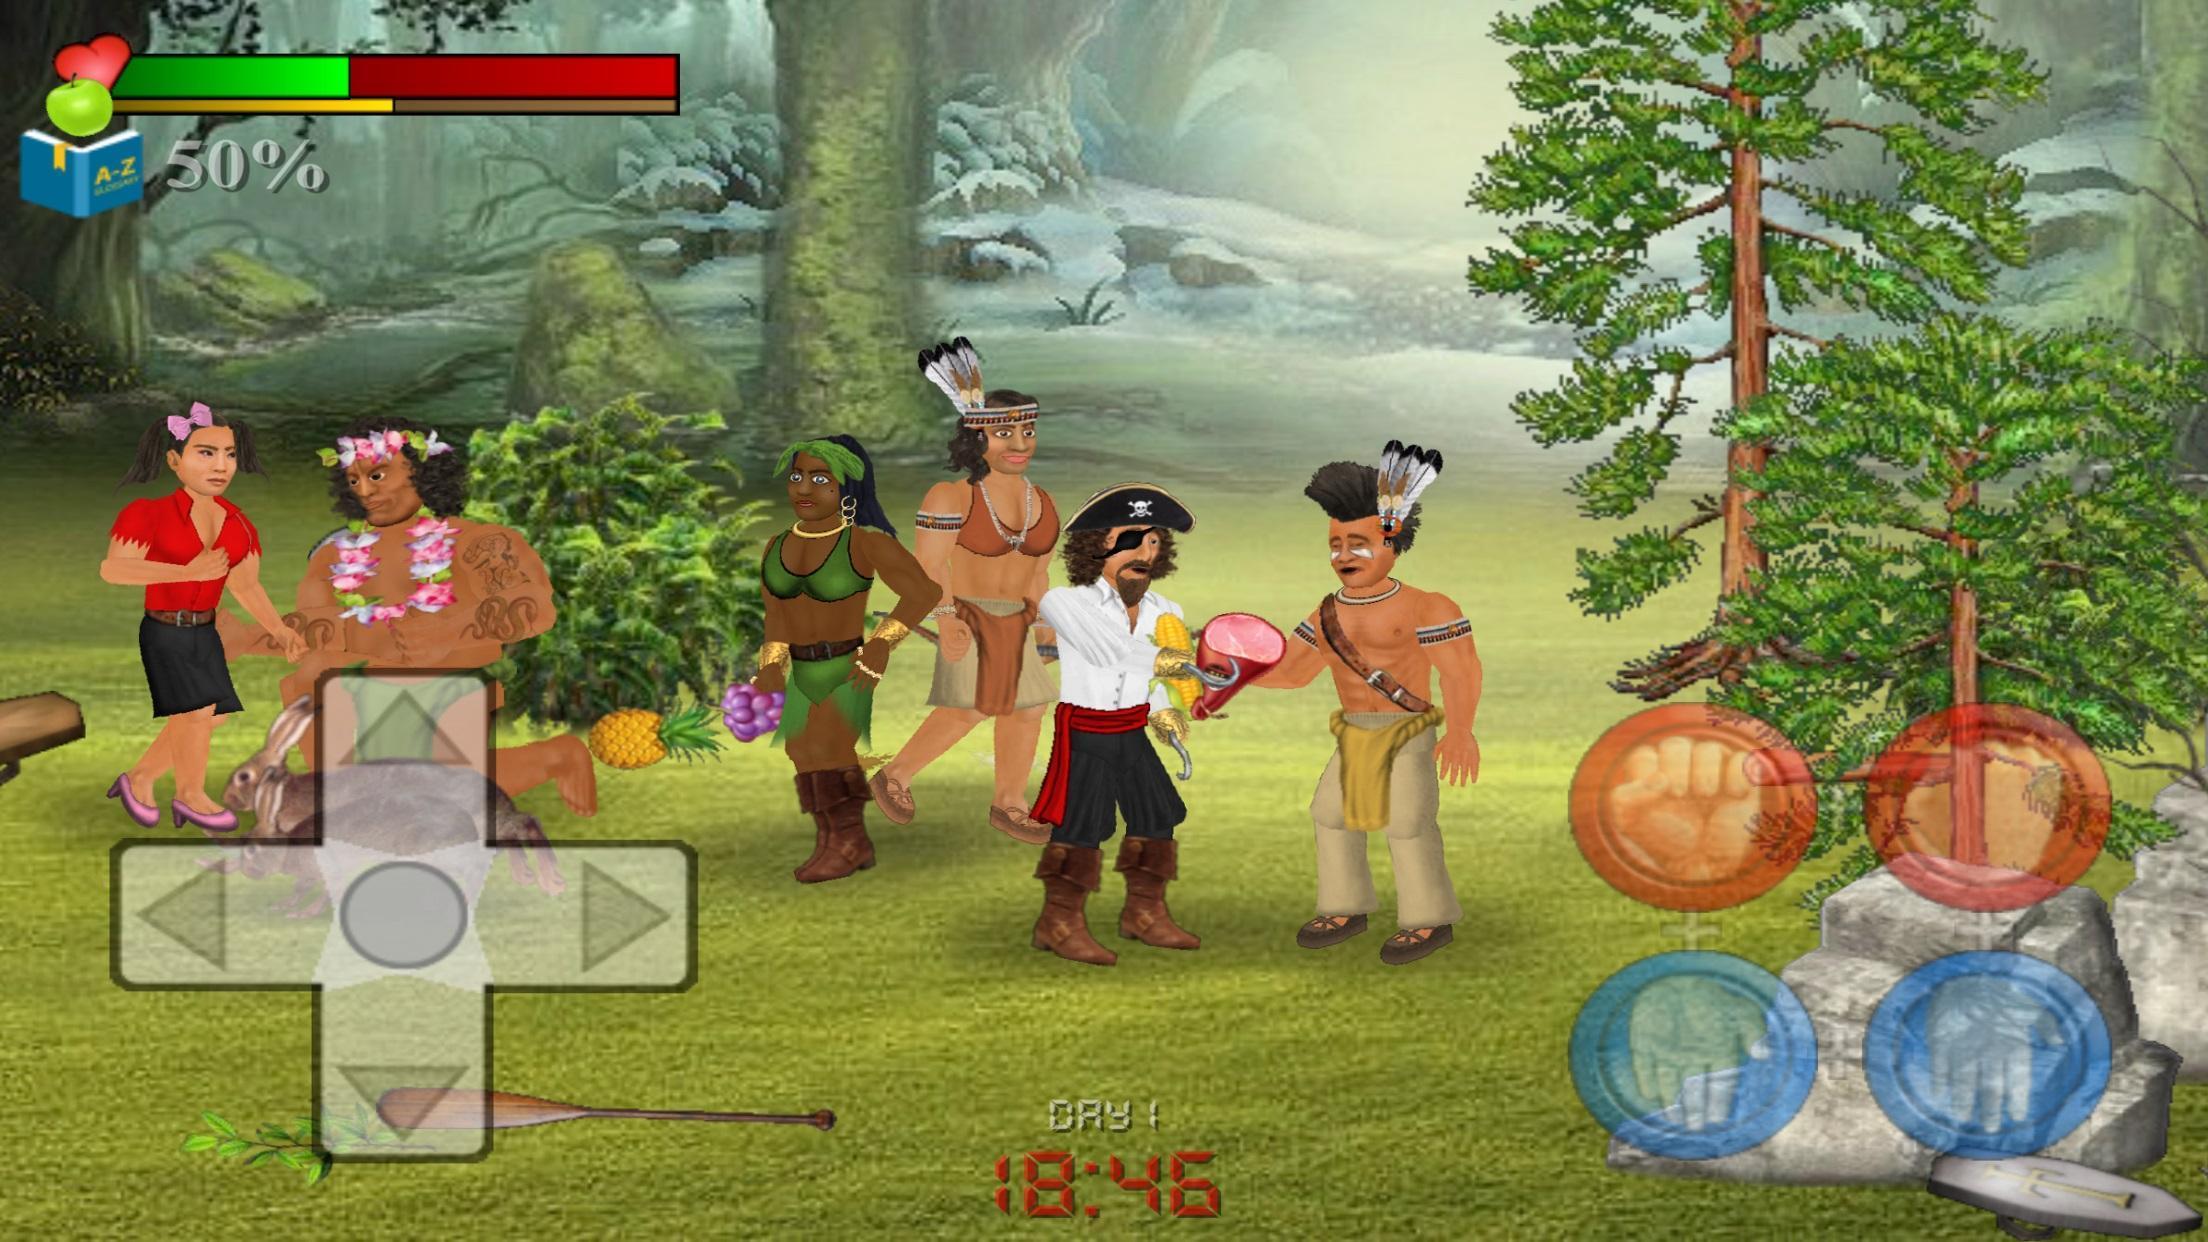 Wrecked (Island Survival Sim) 1.144 Screenshot 3